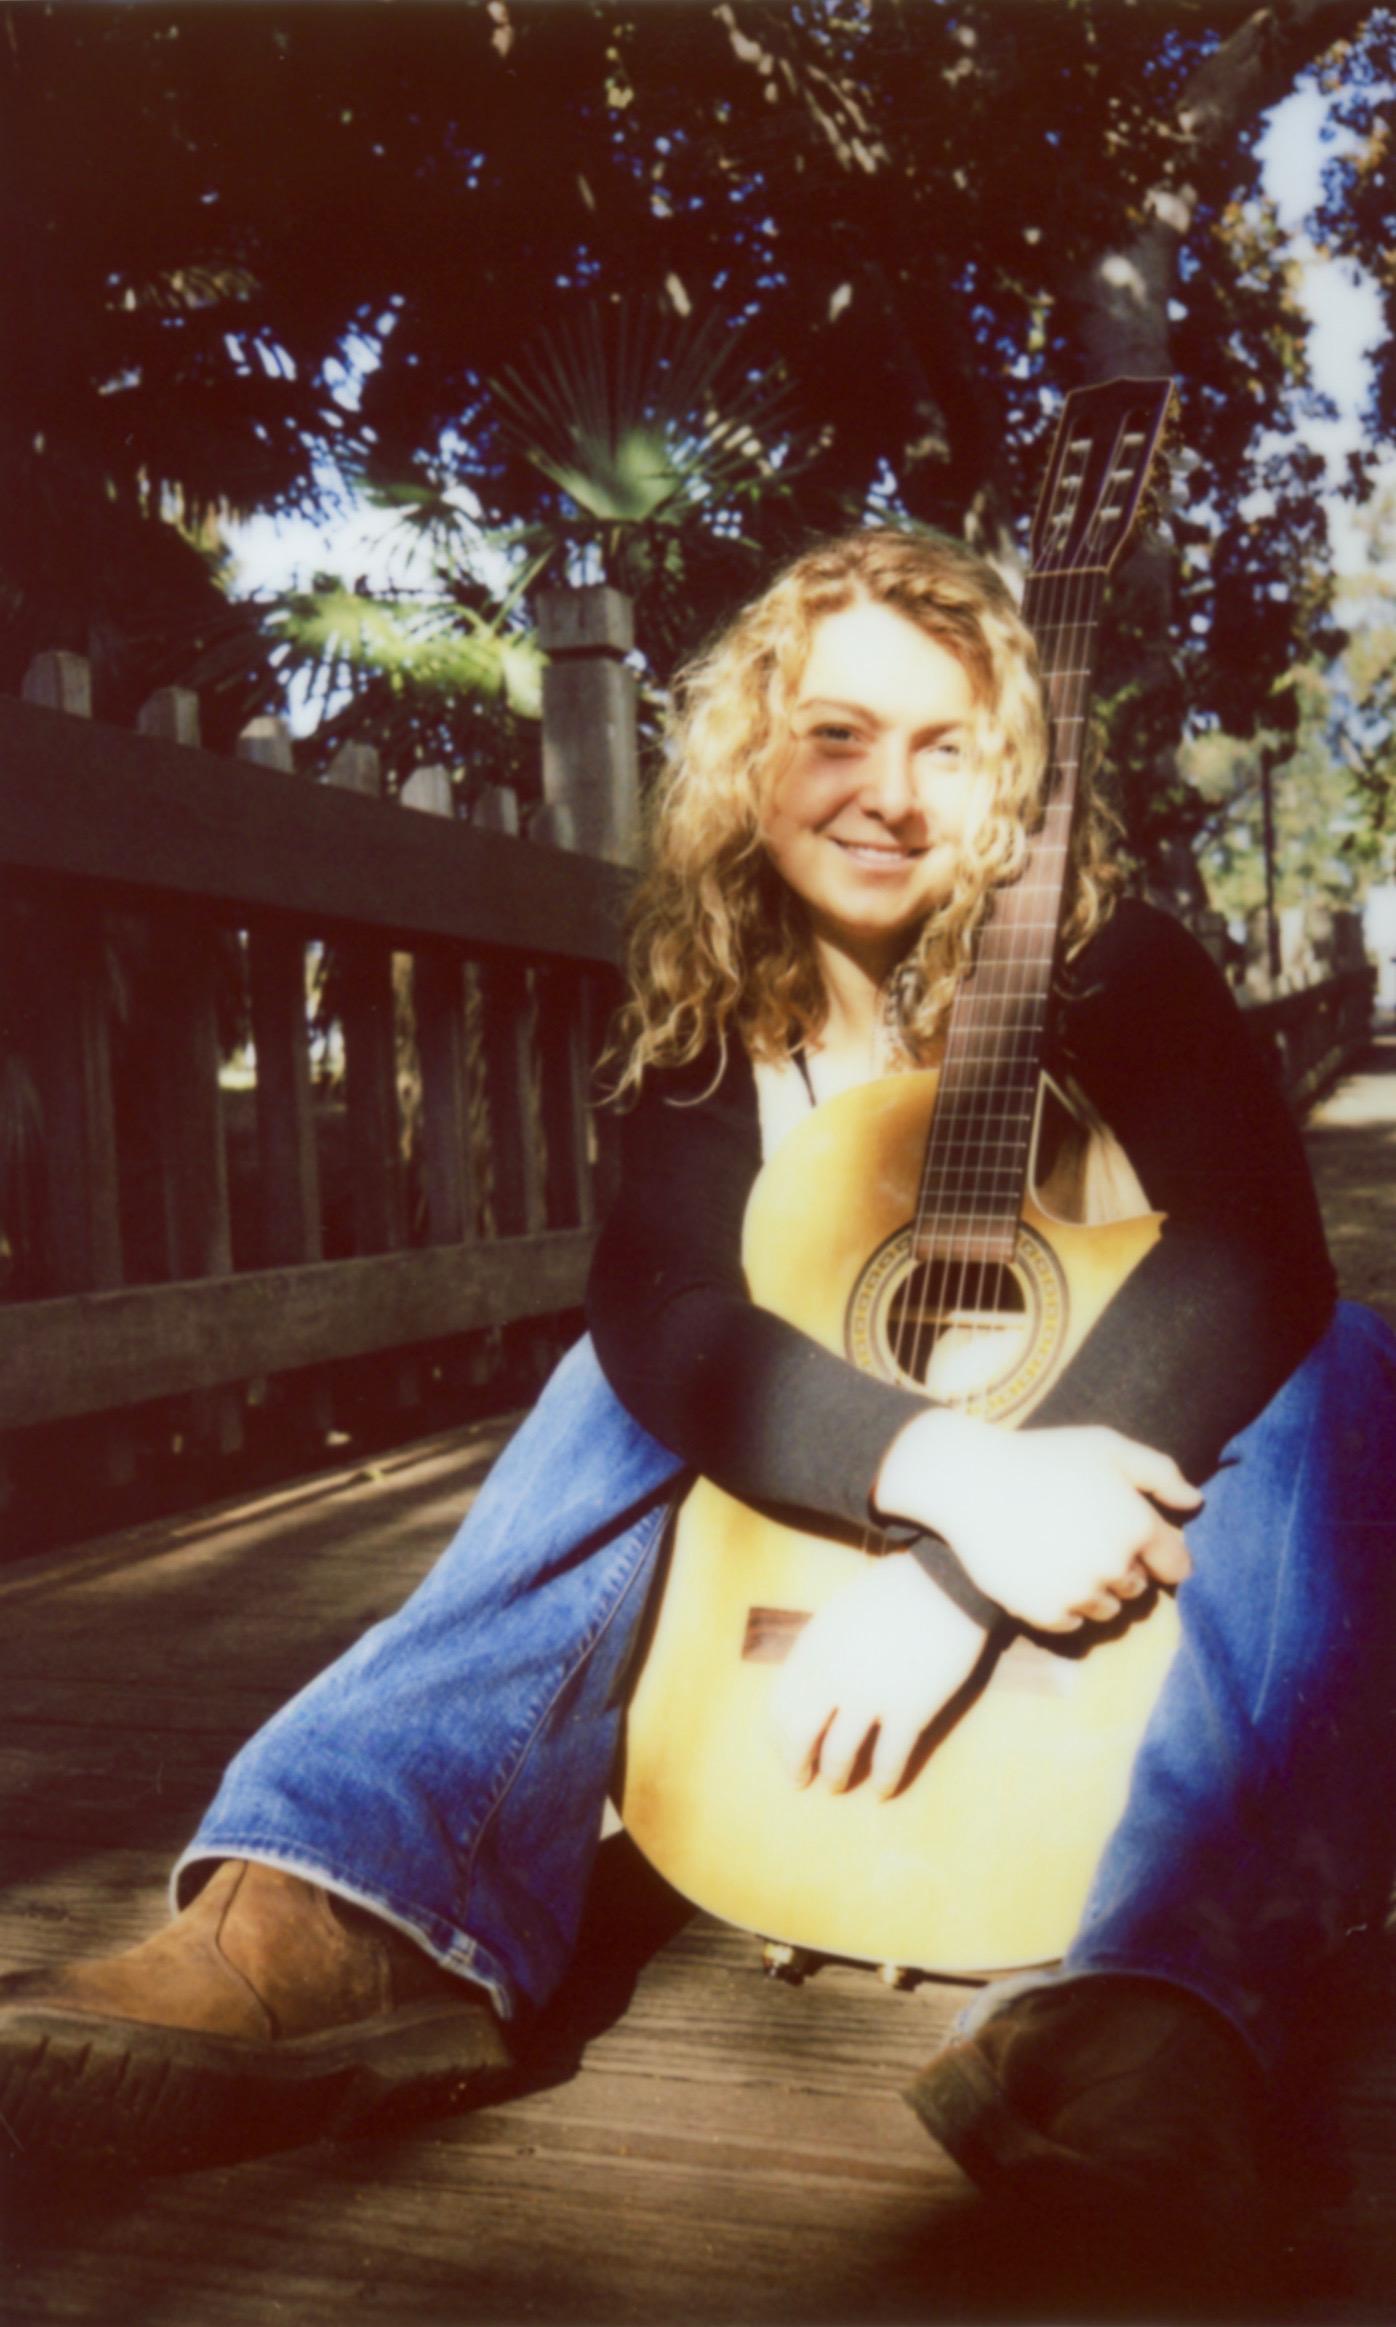 sandiegomusician-sandiegosingersongwriter-singersongwriter-acousticcovers-courtneypreis-femalemusician-upliftingmusic-socalmusicscene